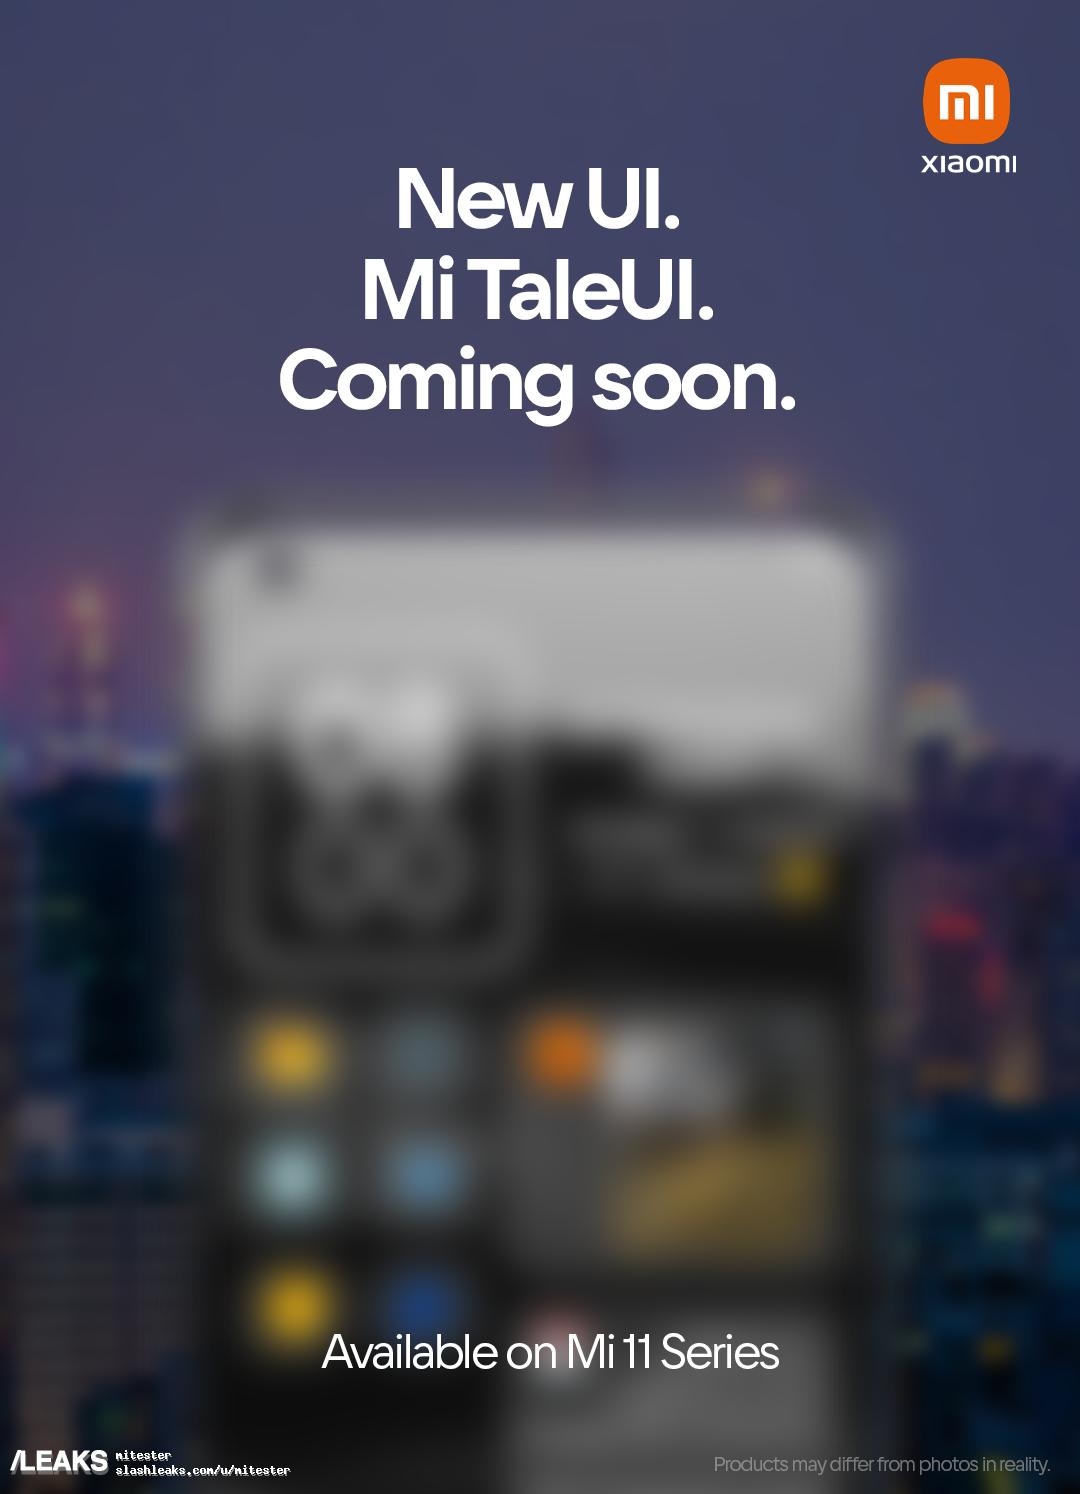 img New Xiaomi UI Shell for flagships (Mi 11) - Mi TaleUI